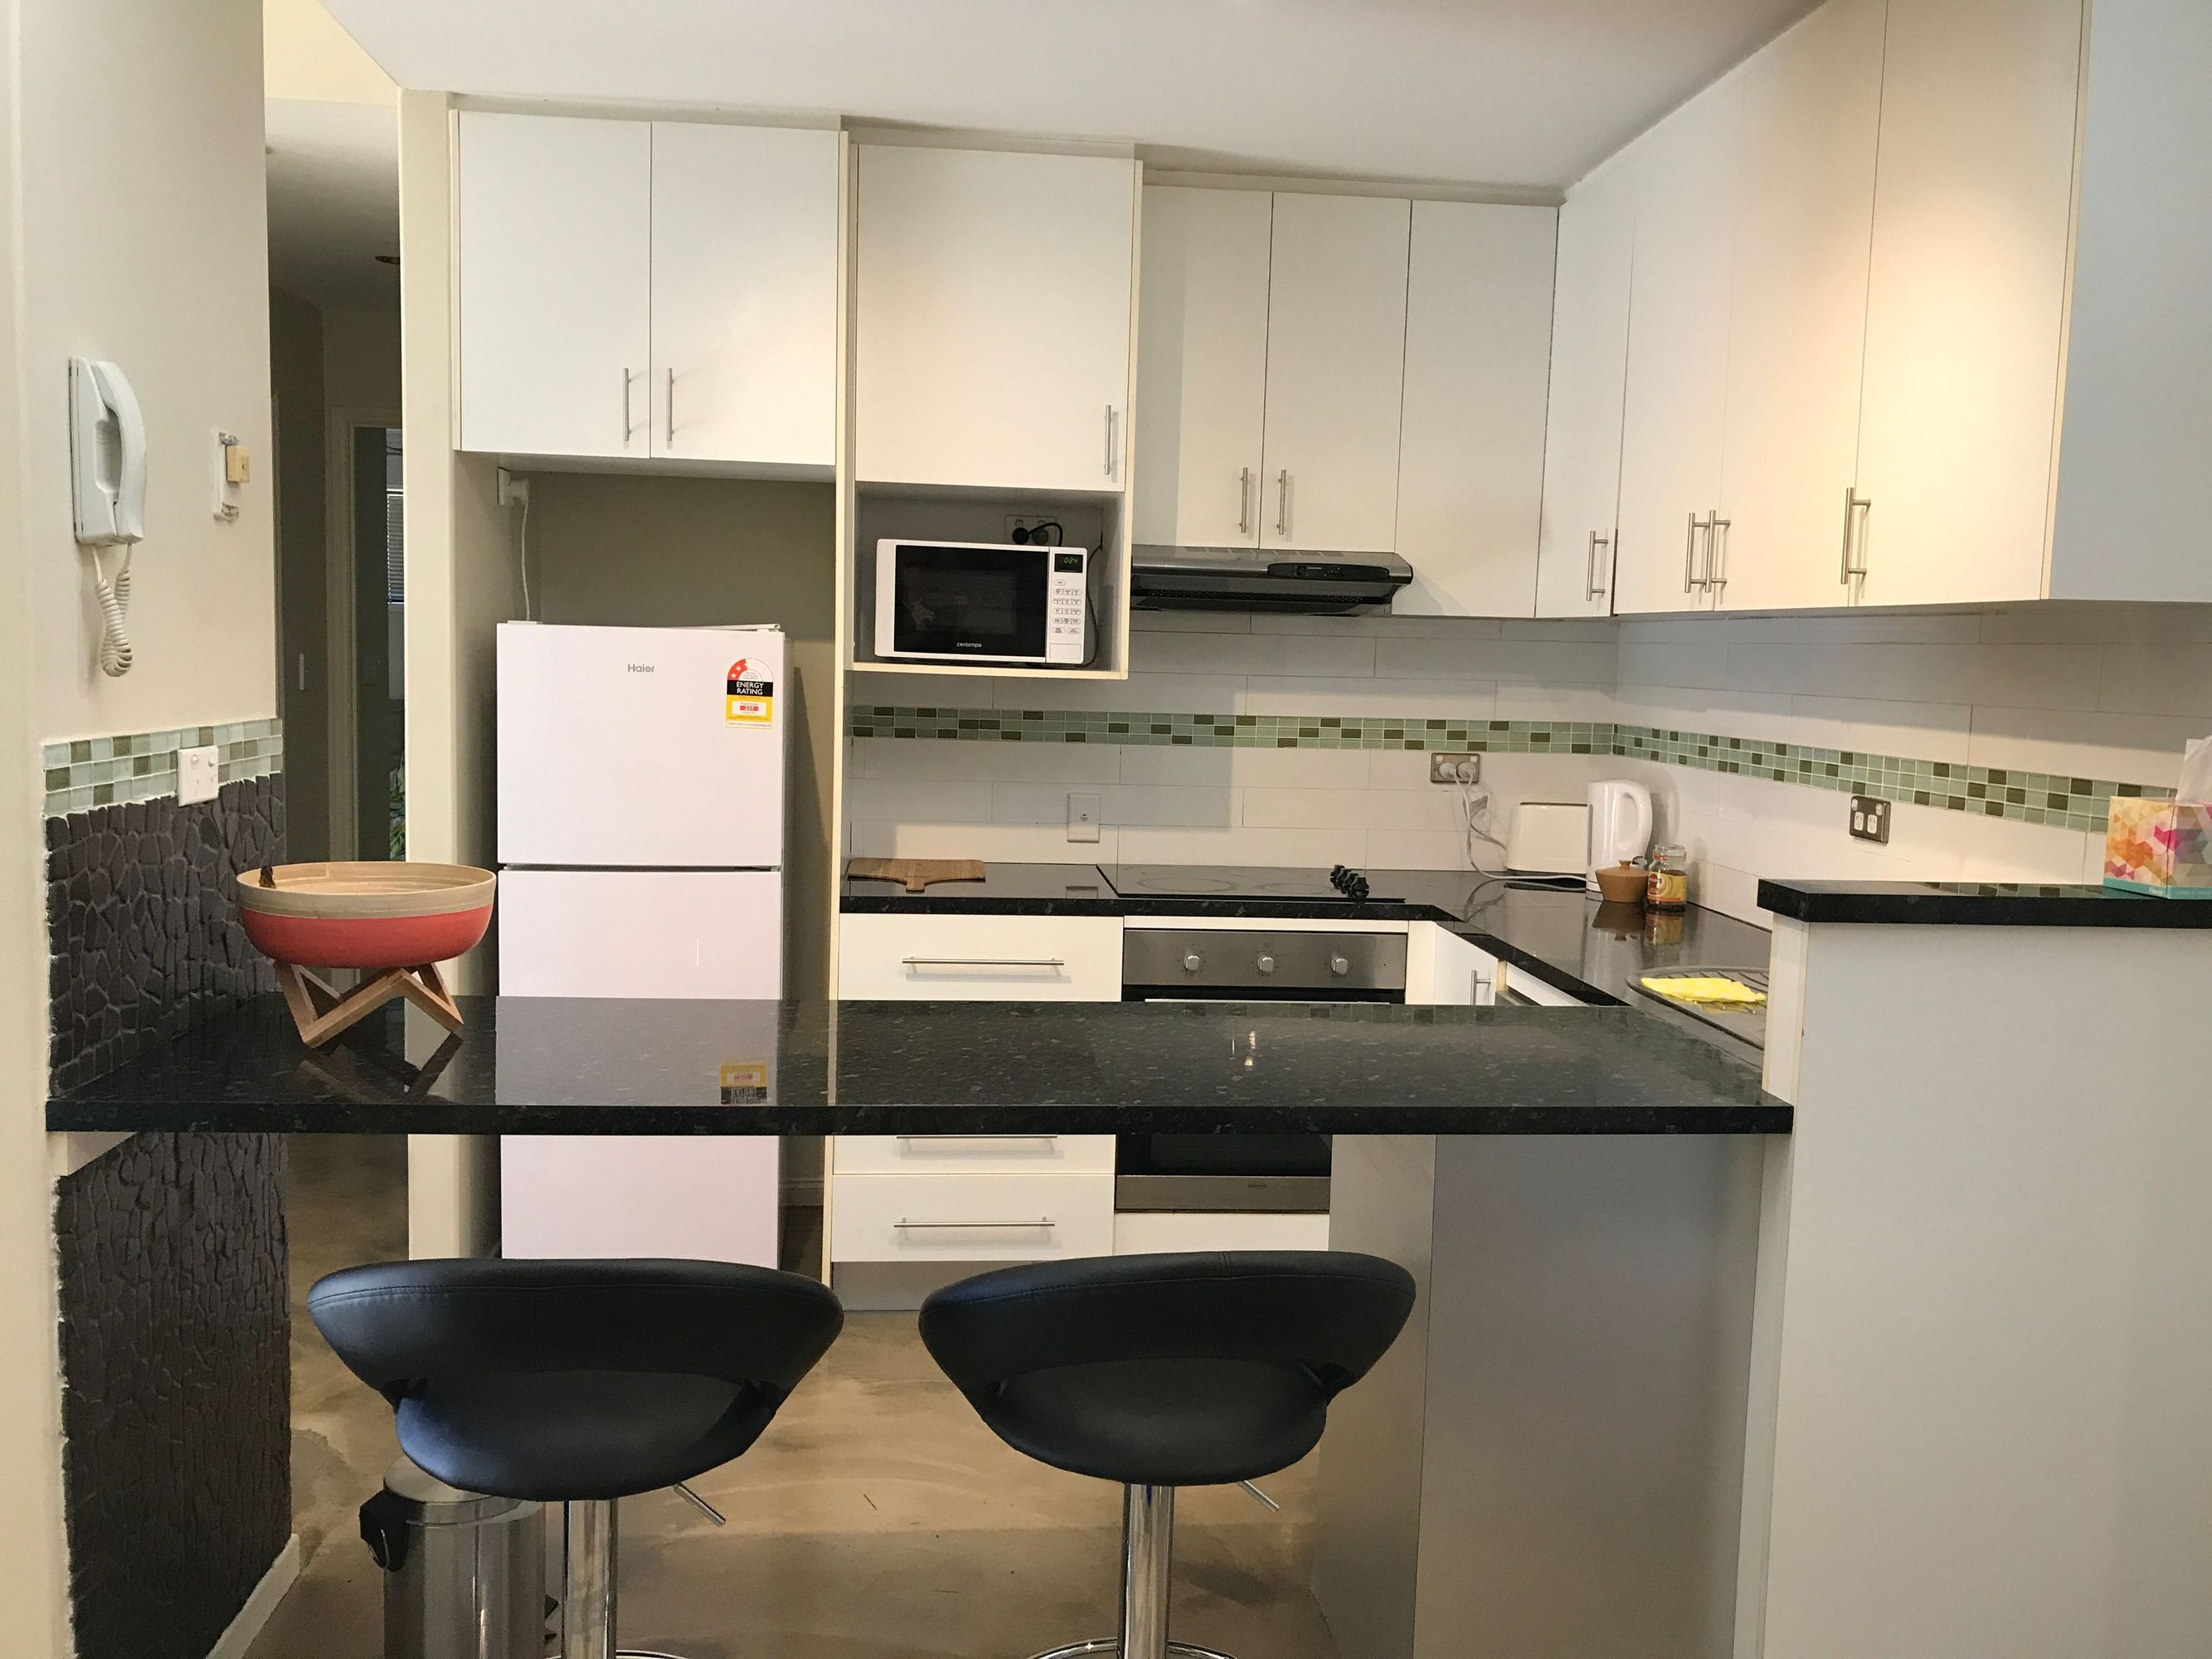 22/25 Thorngate Drive, Robina, QLD 4226